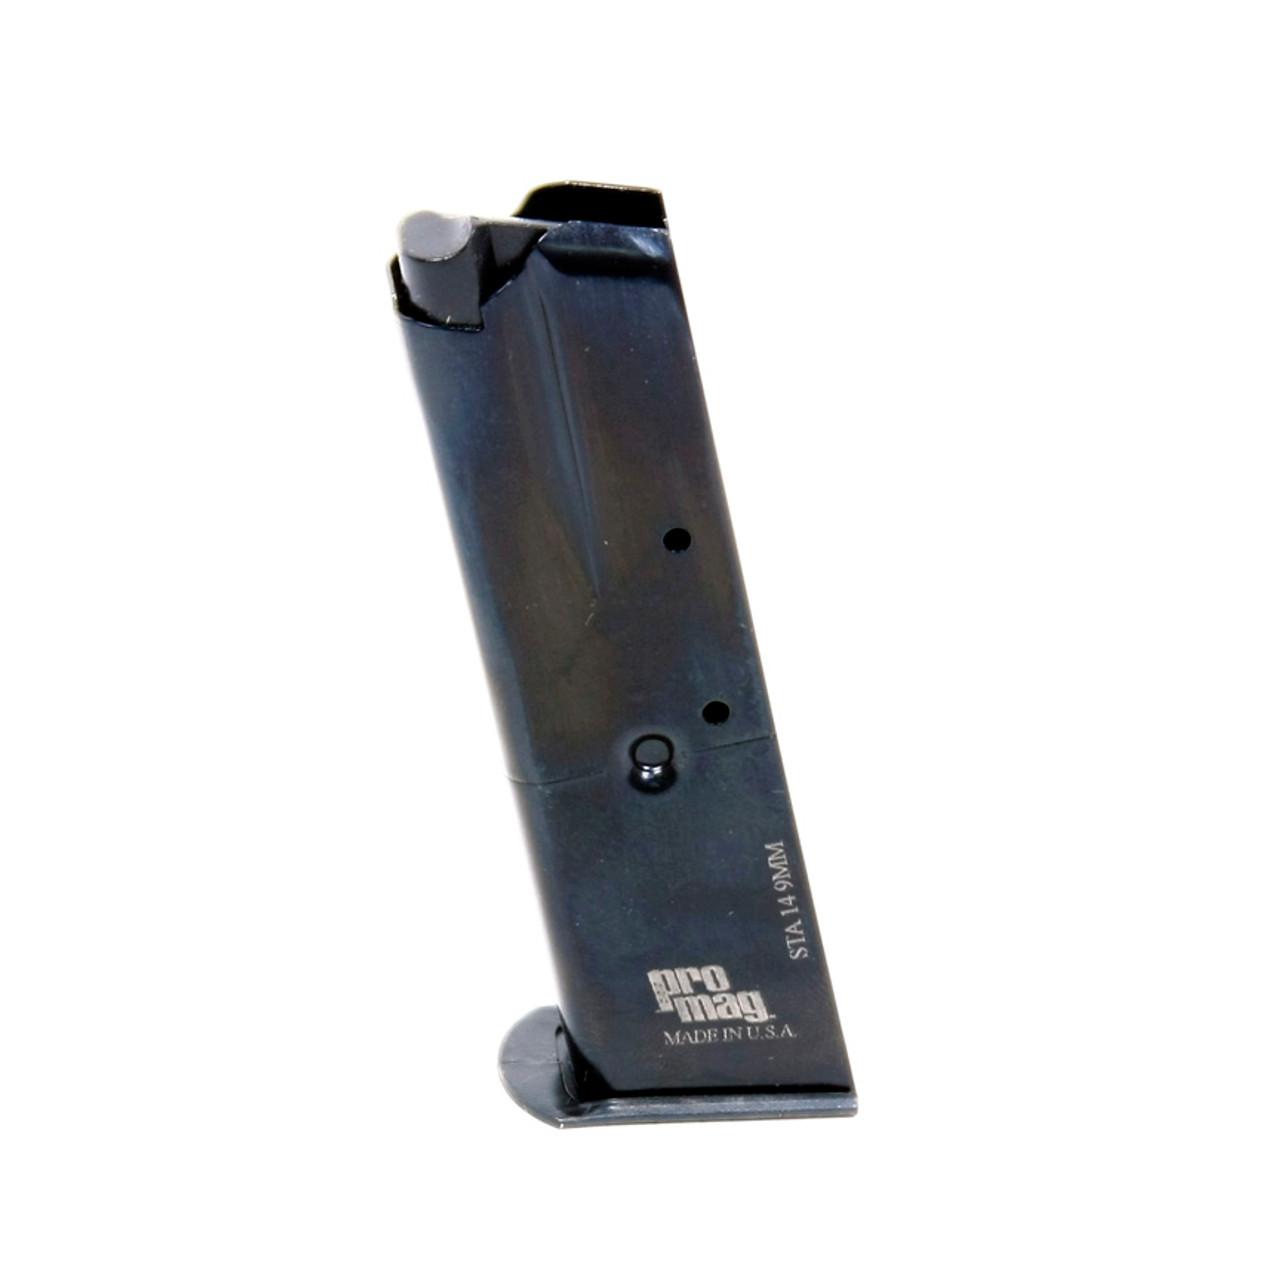 Star 30M 9mm (10) Rd - Blue Steel